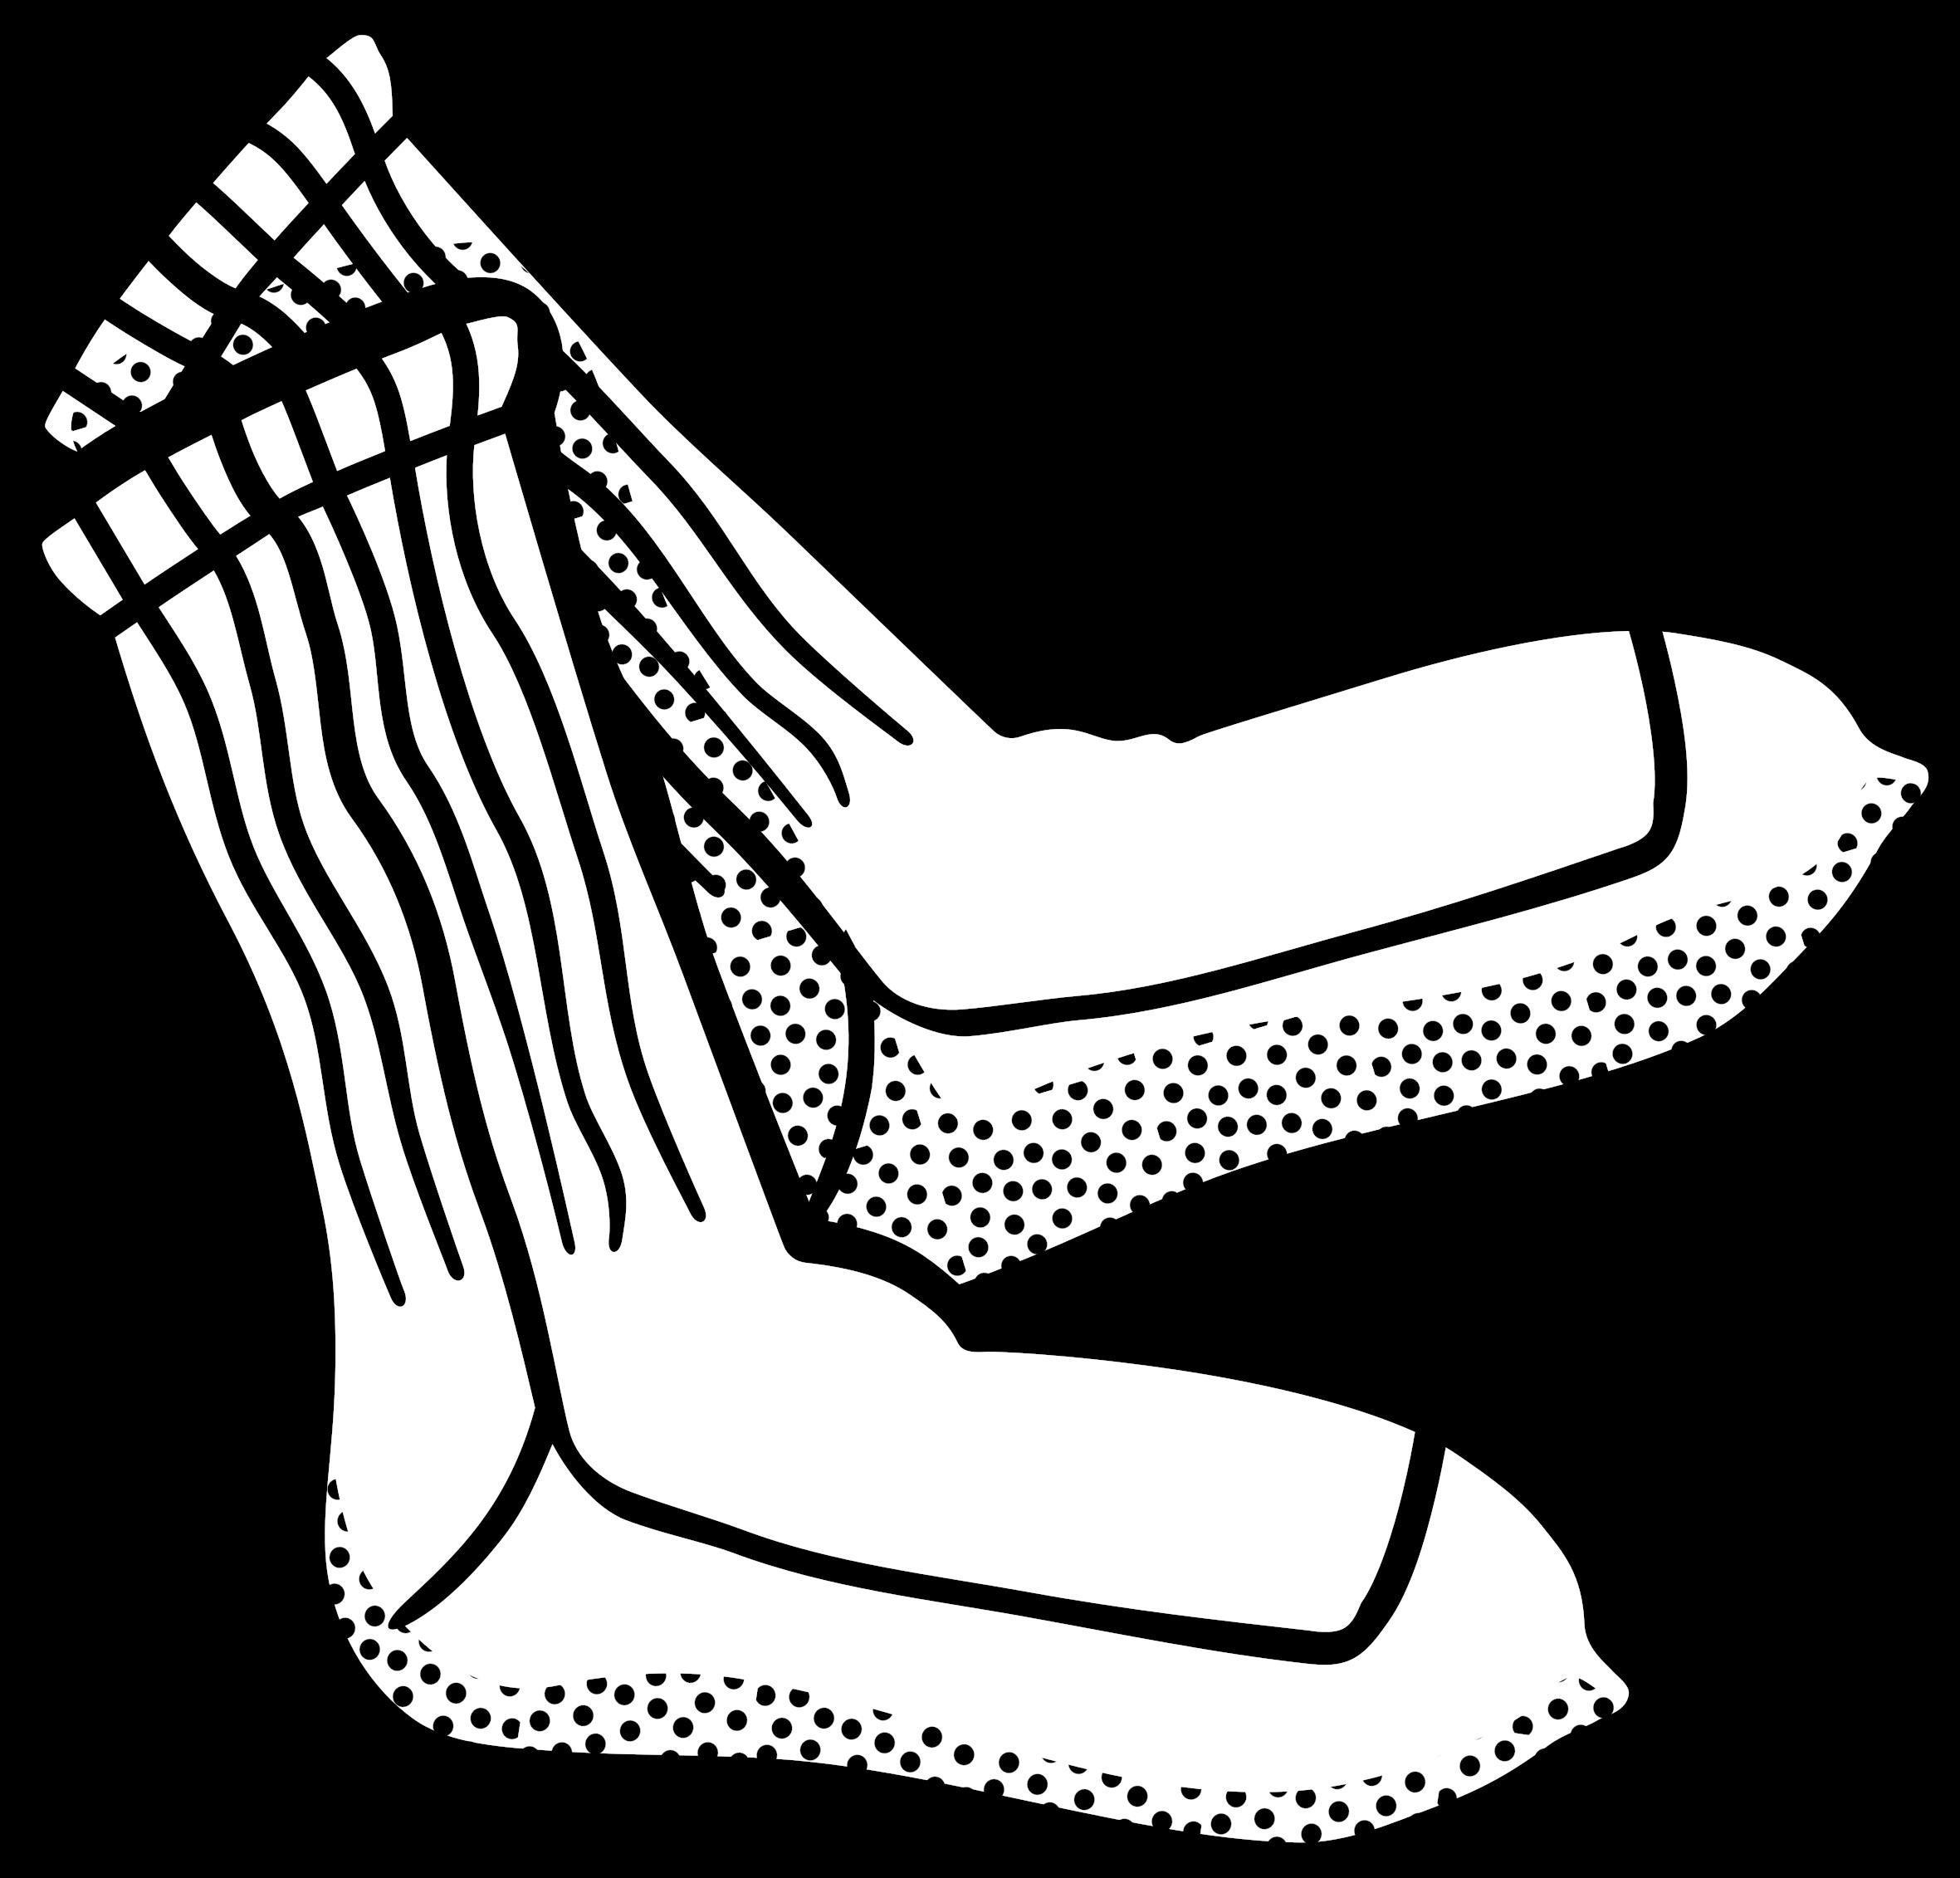 Hd sock line art. Clipart socks school